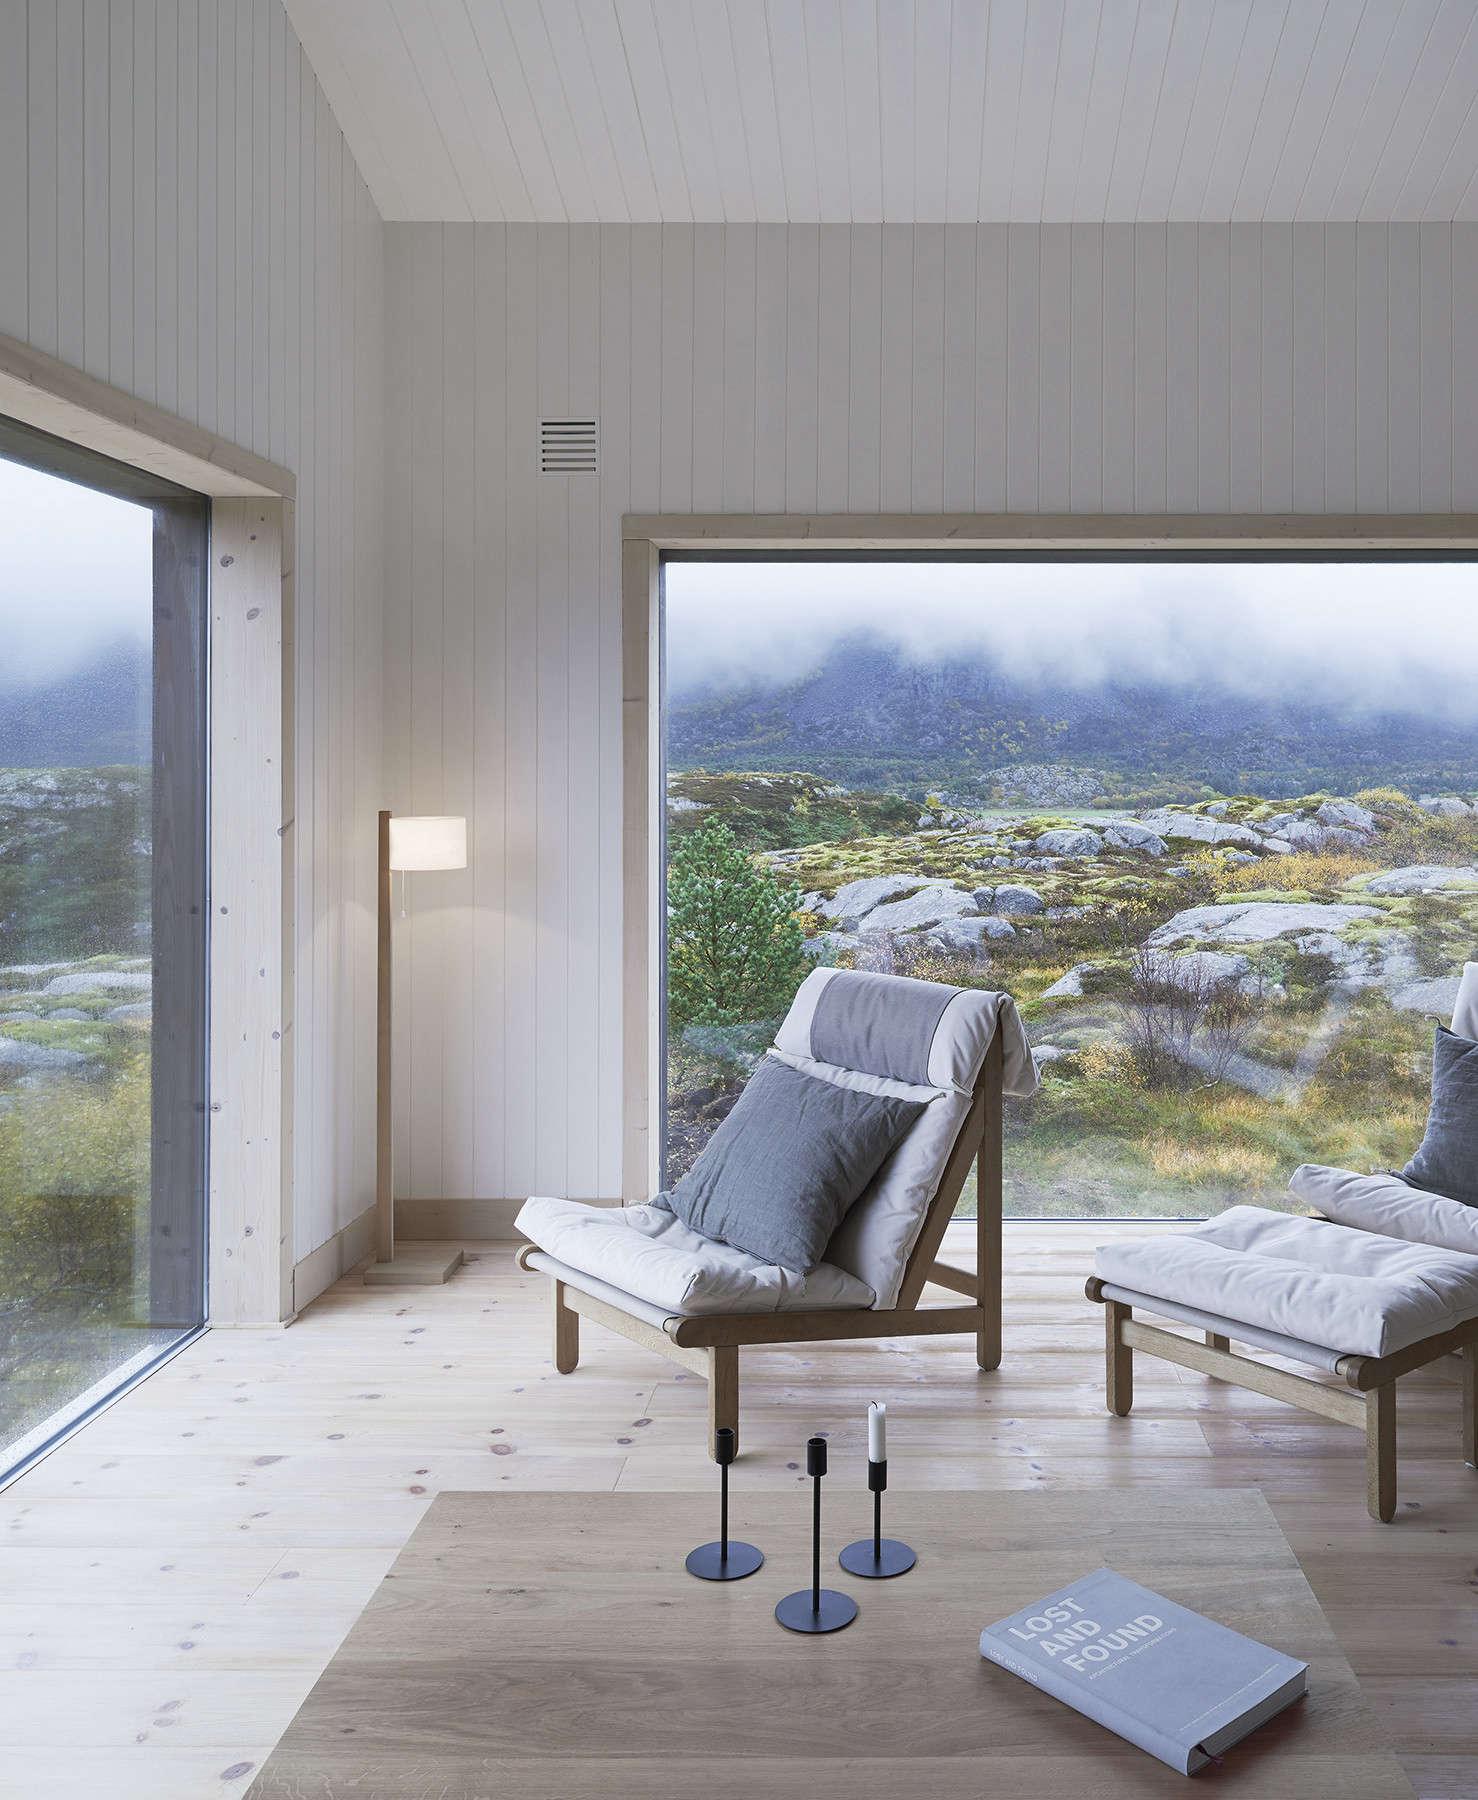 summerhaus nauste by kolman boye architects 12